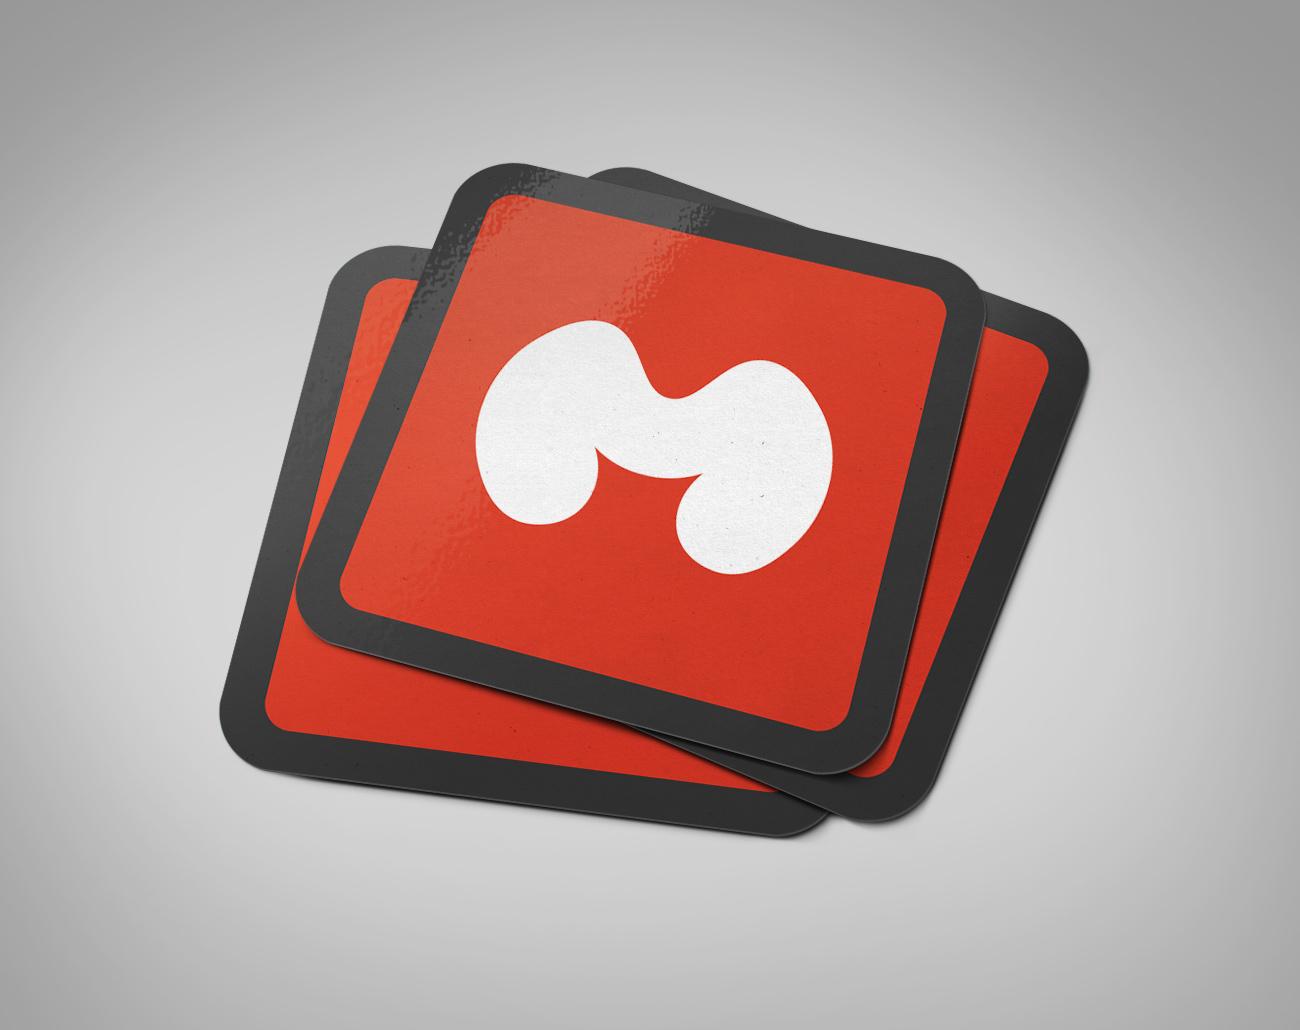 دانلود موکاپ کارت ویزیت مربع لمینت براق 1